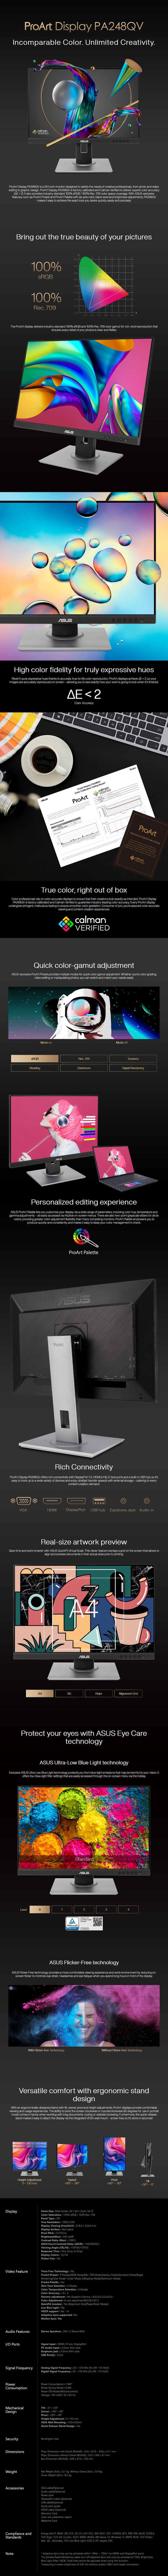 asus-proart-pa248qv-241-wuxga-100-srgb-professional-ips-monitor-ac38704-7.jpg